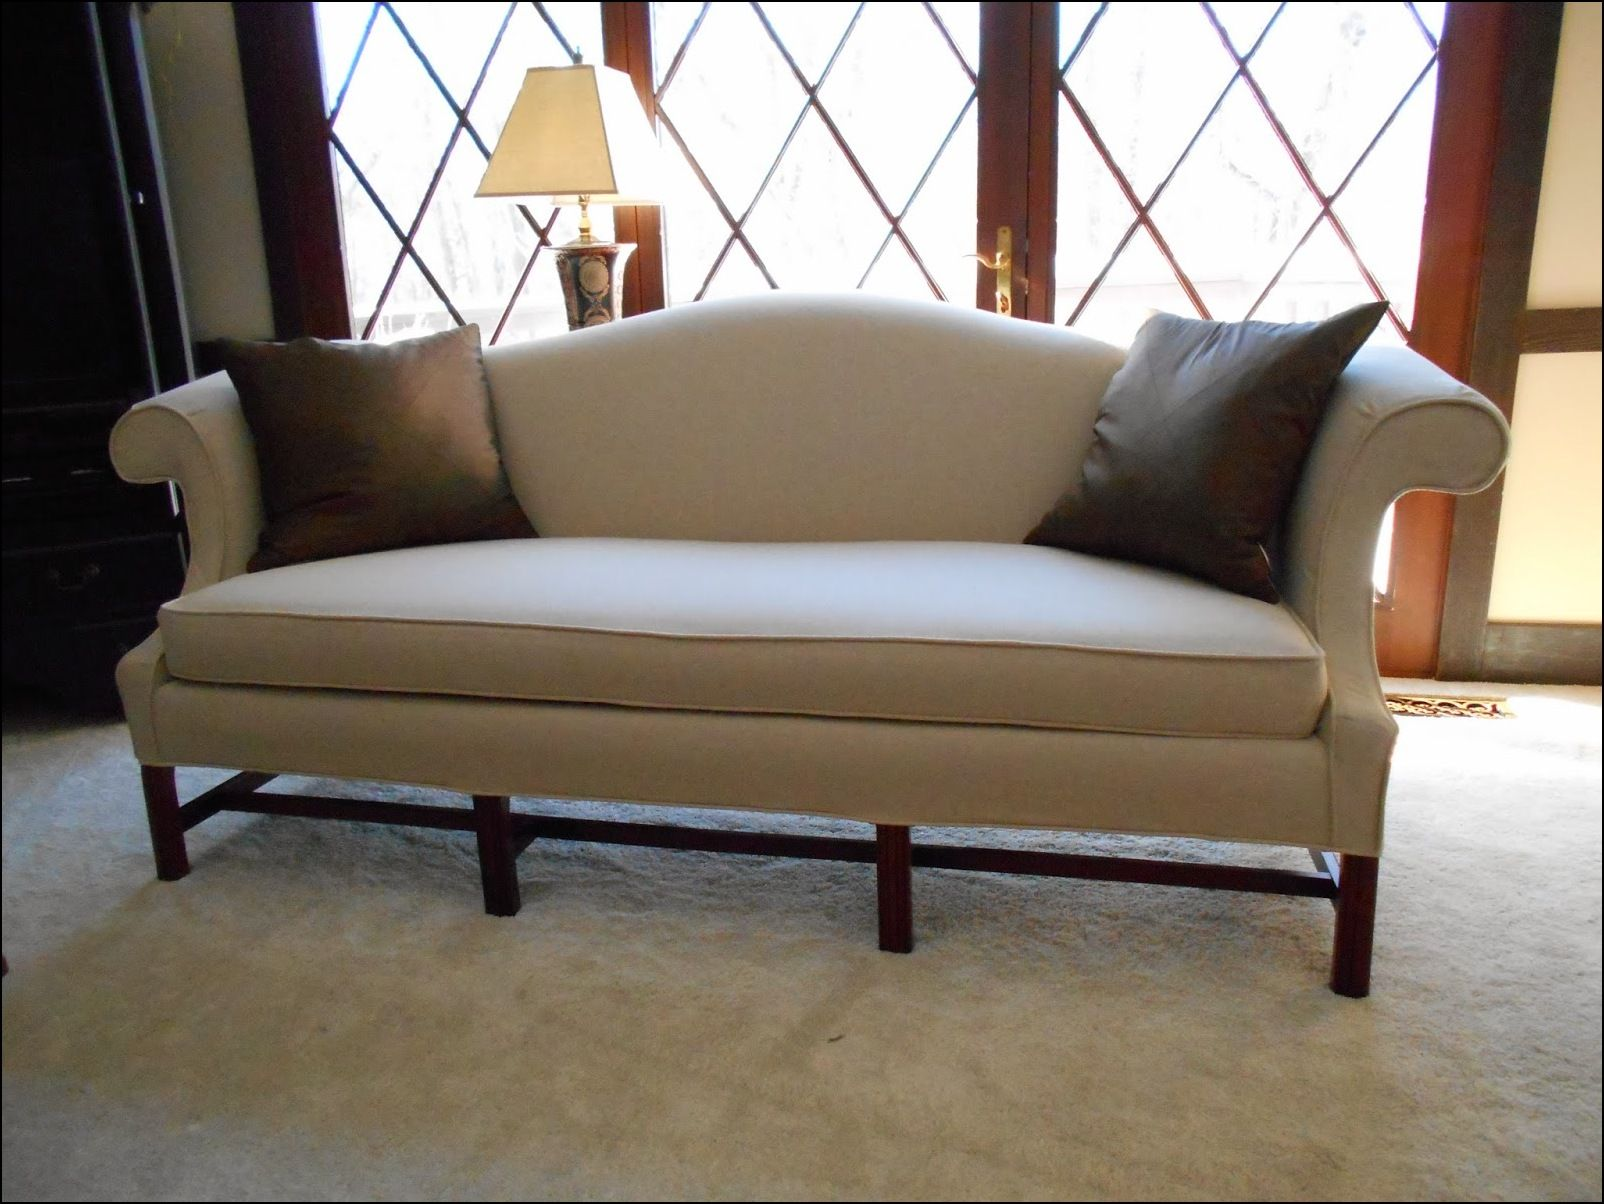 camel back sofa ideas minimalist home ideas sofa sofa styling rh pinterest com